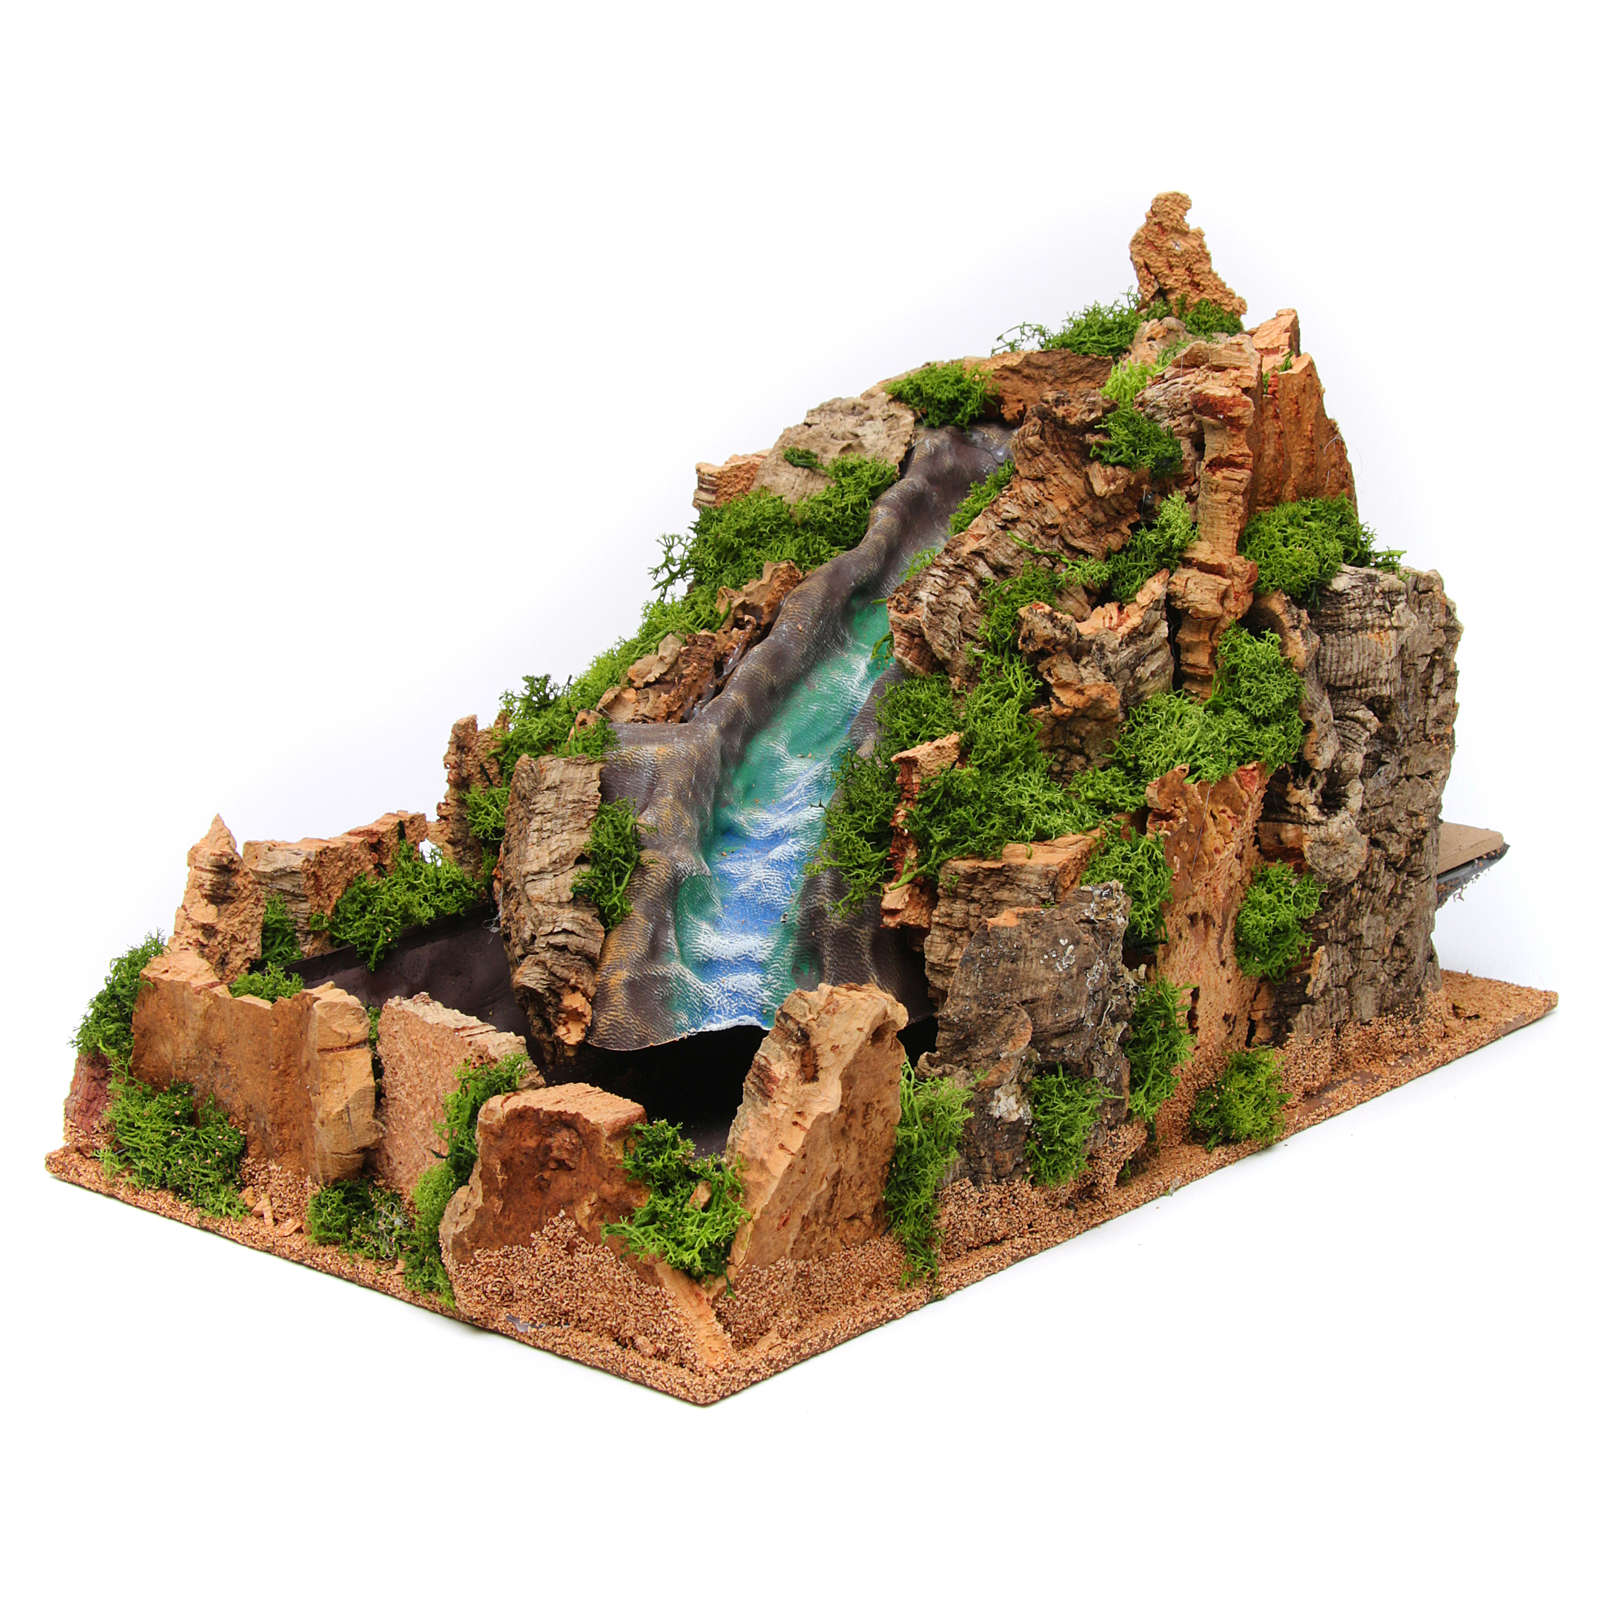 Waterfall for Nativity Scene 25x25x40 cm 4